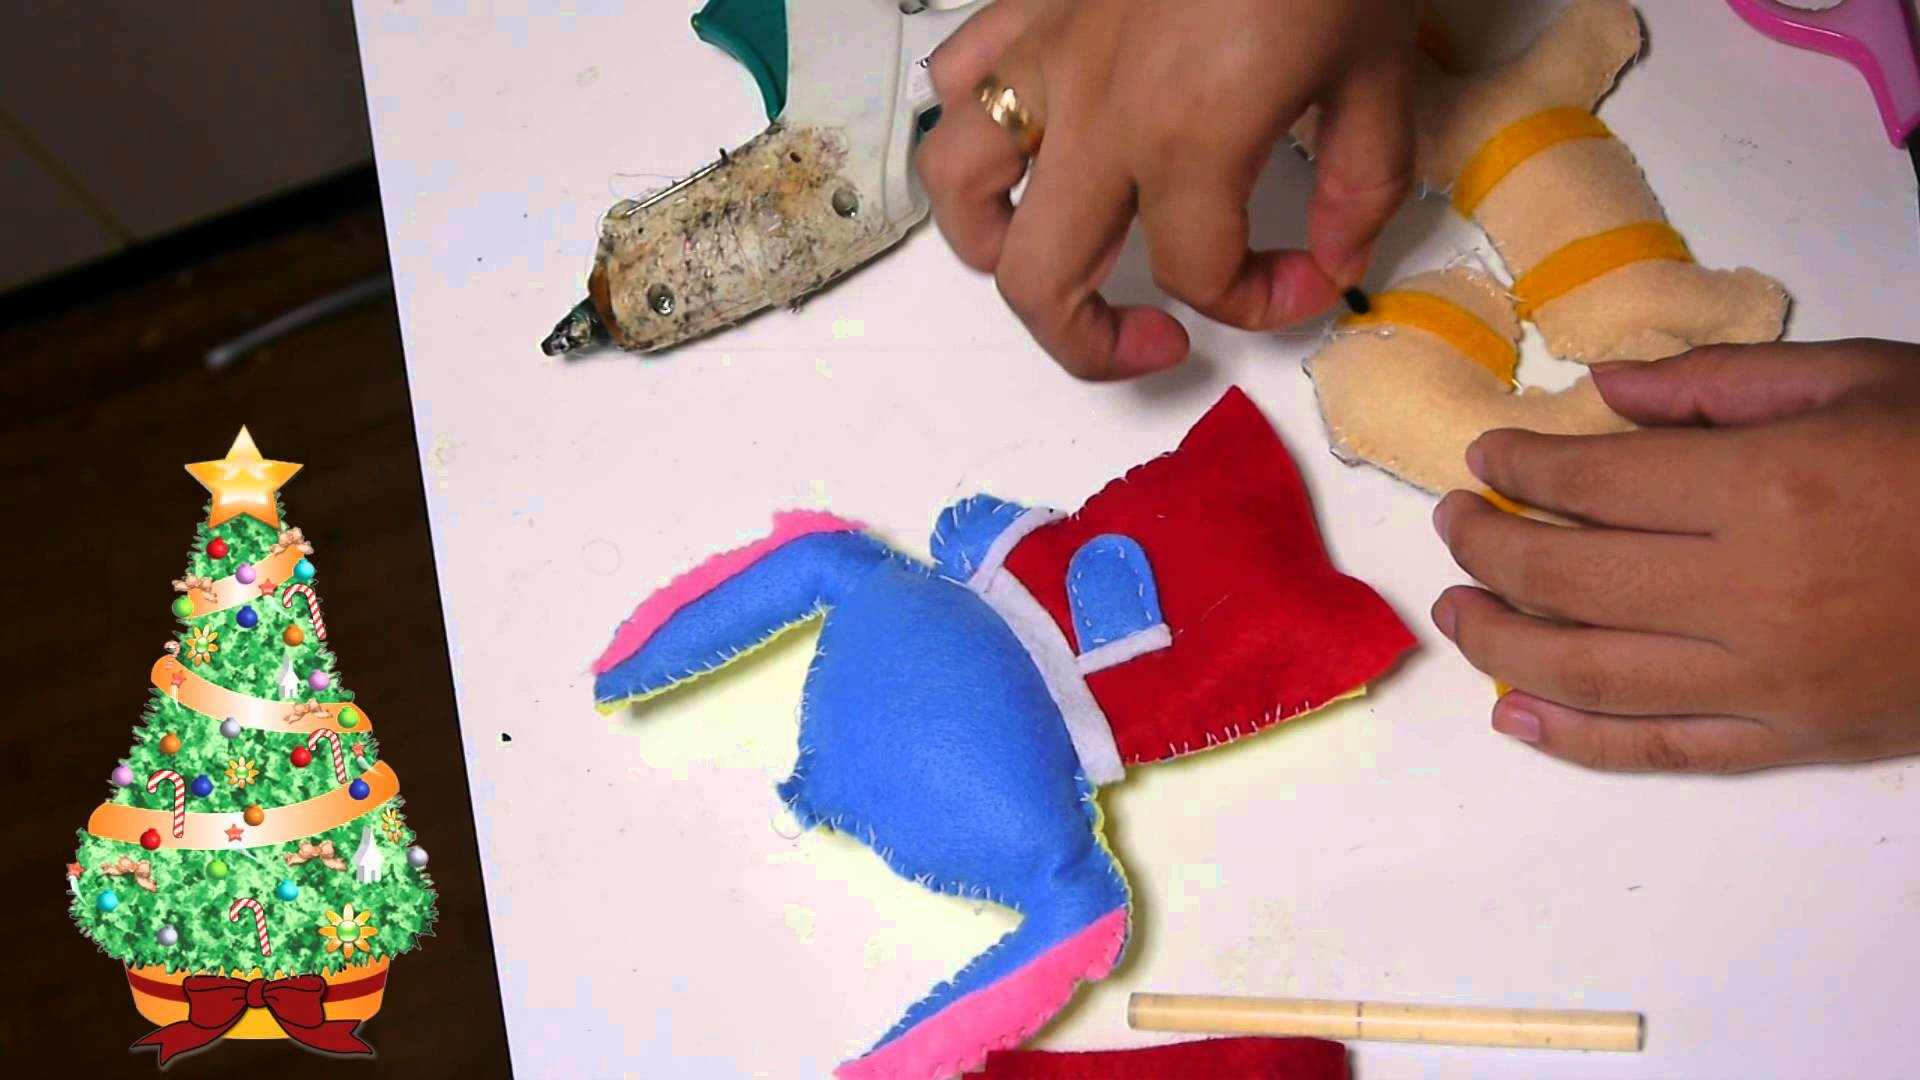 Manualidades Navideñas: Trineo con Stitch  -Juancarlos960